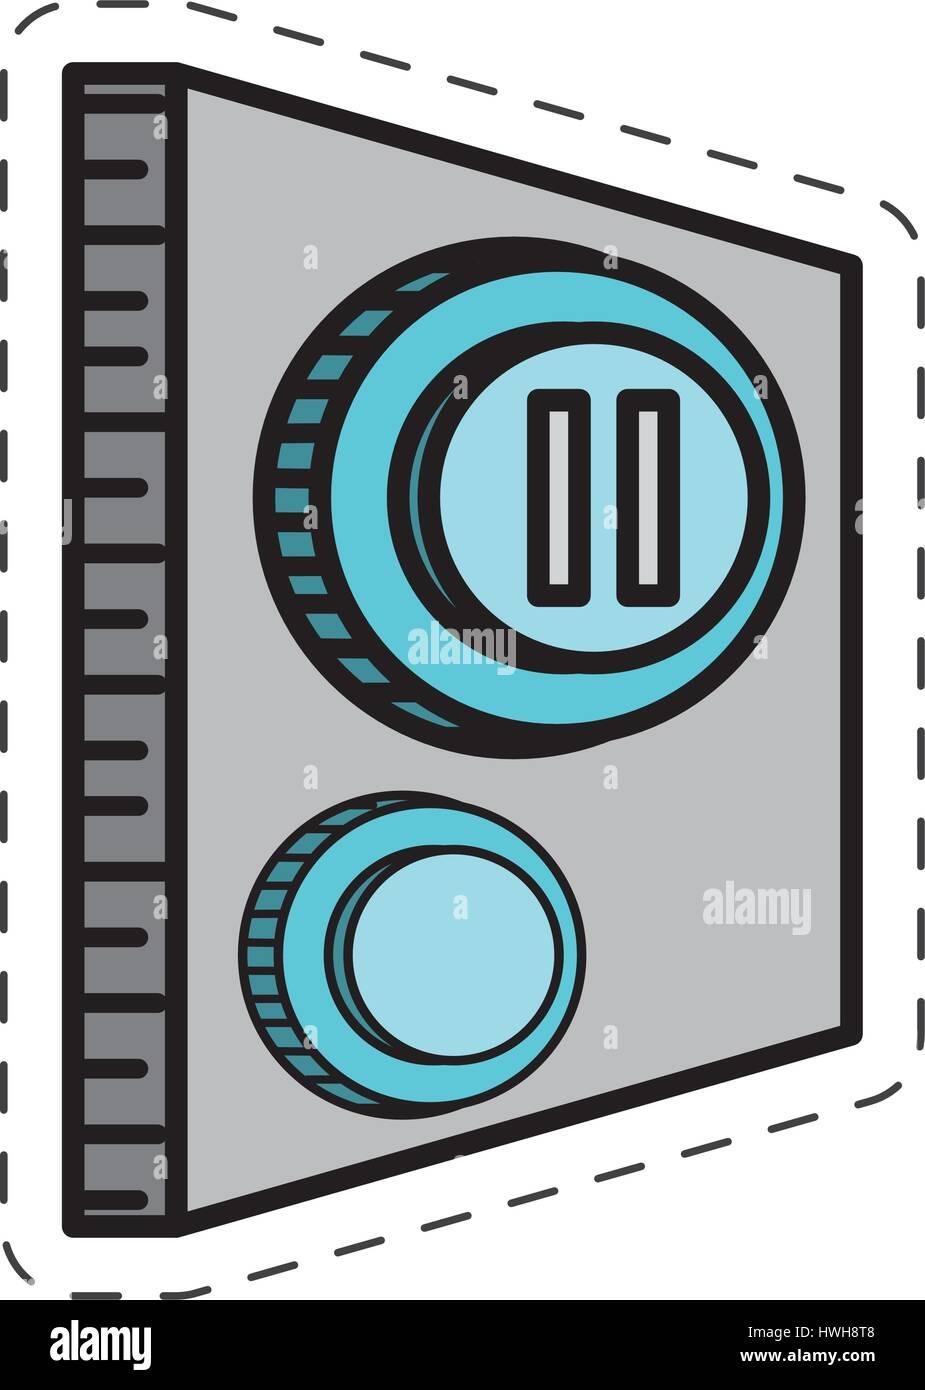 cartoon button pause control image - Stock Image